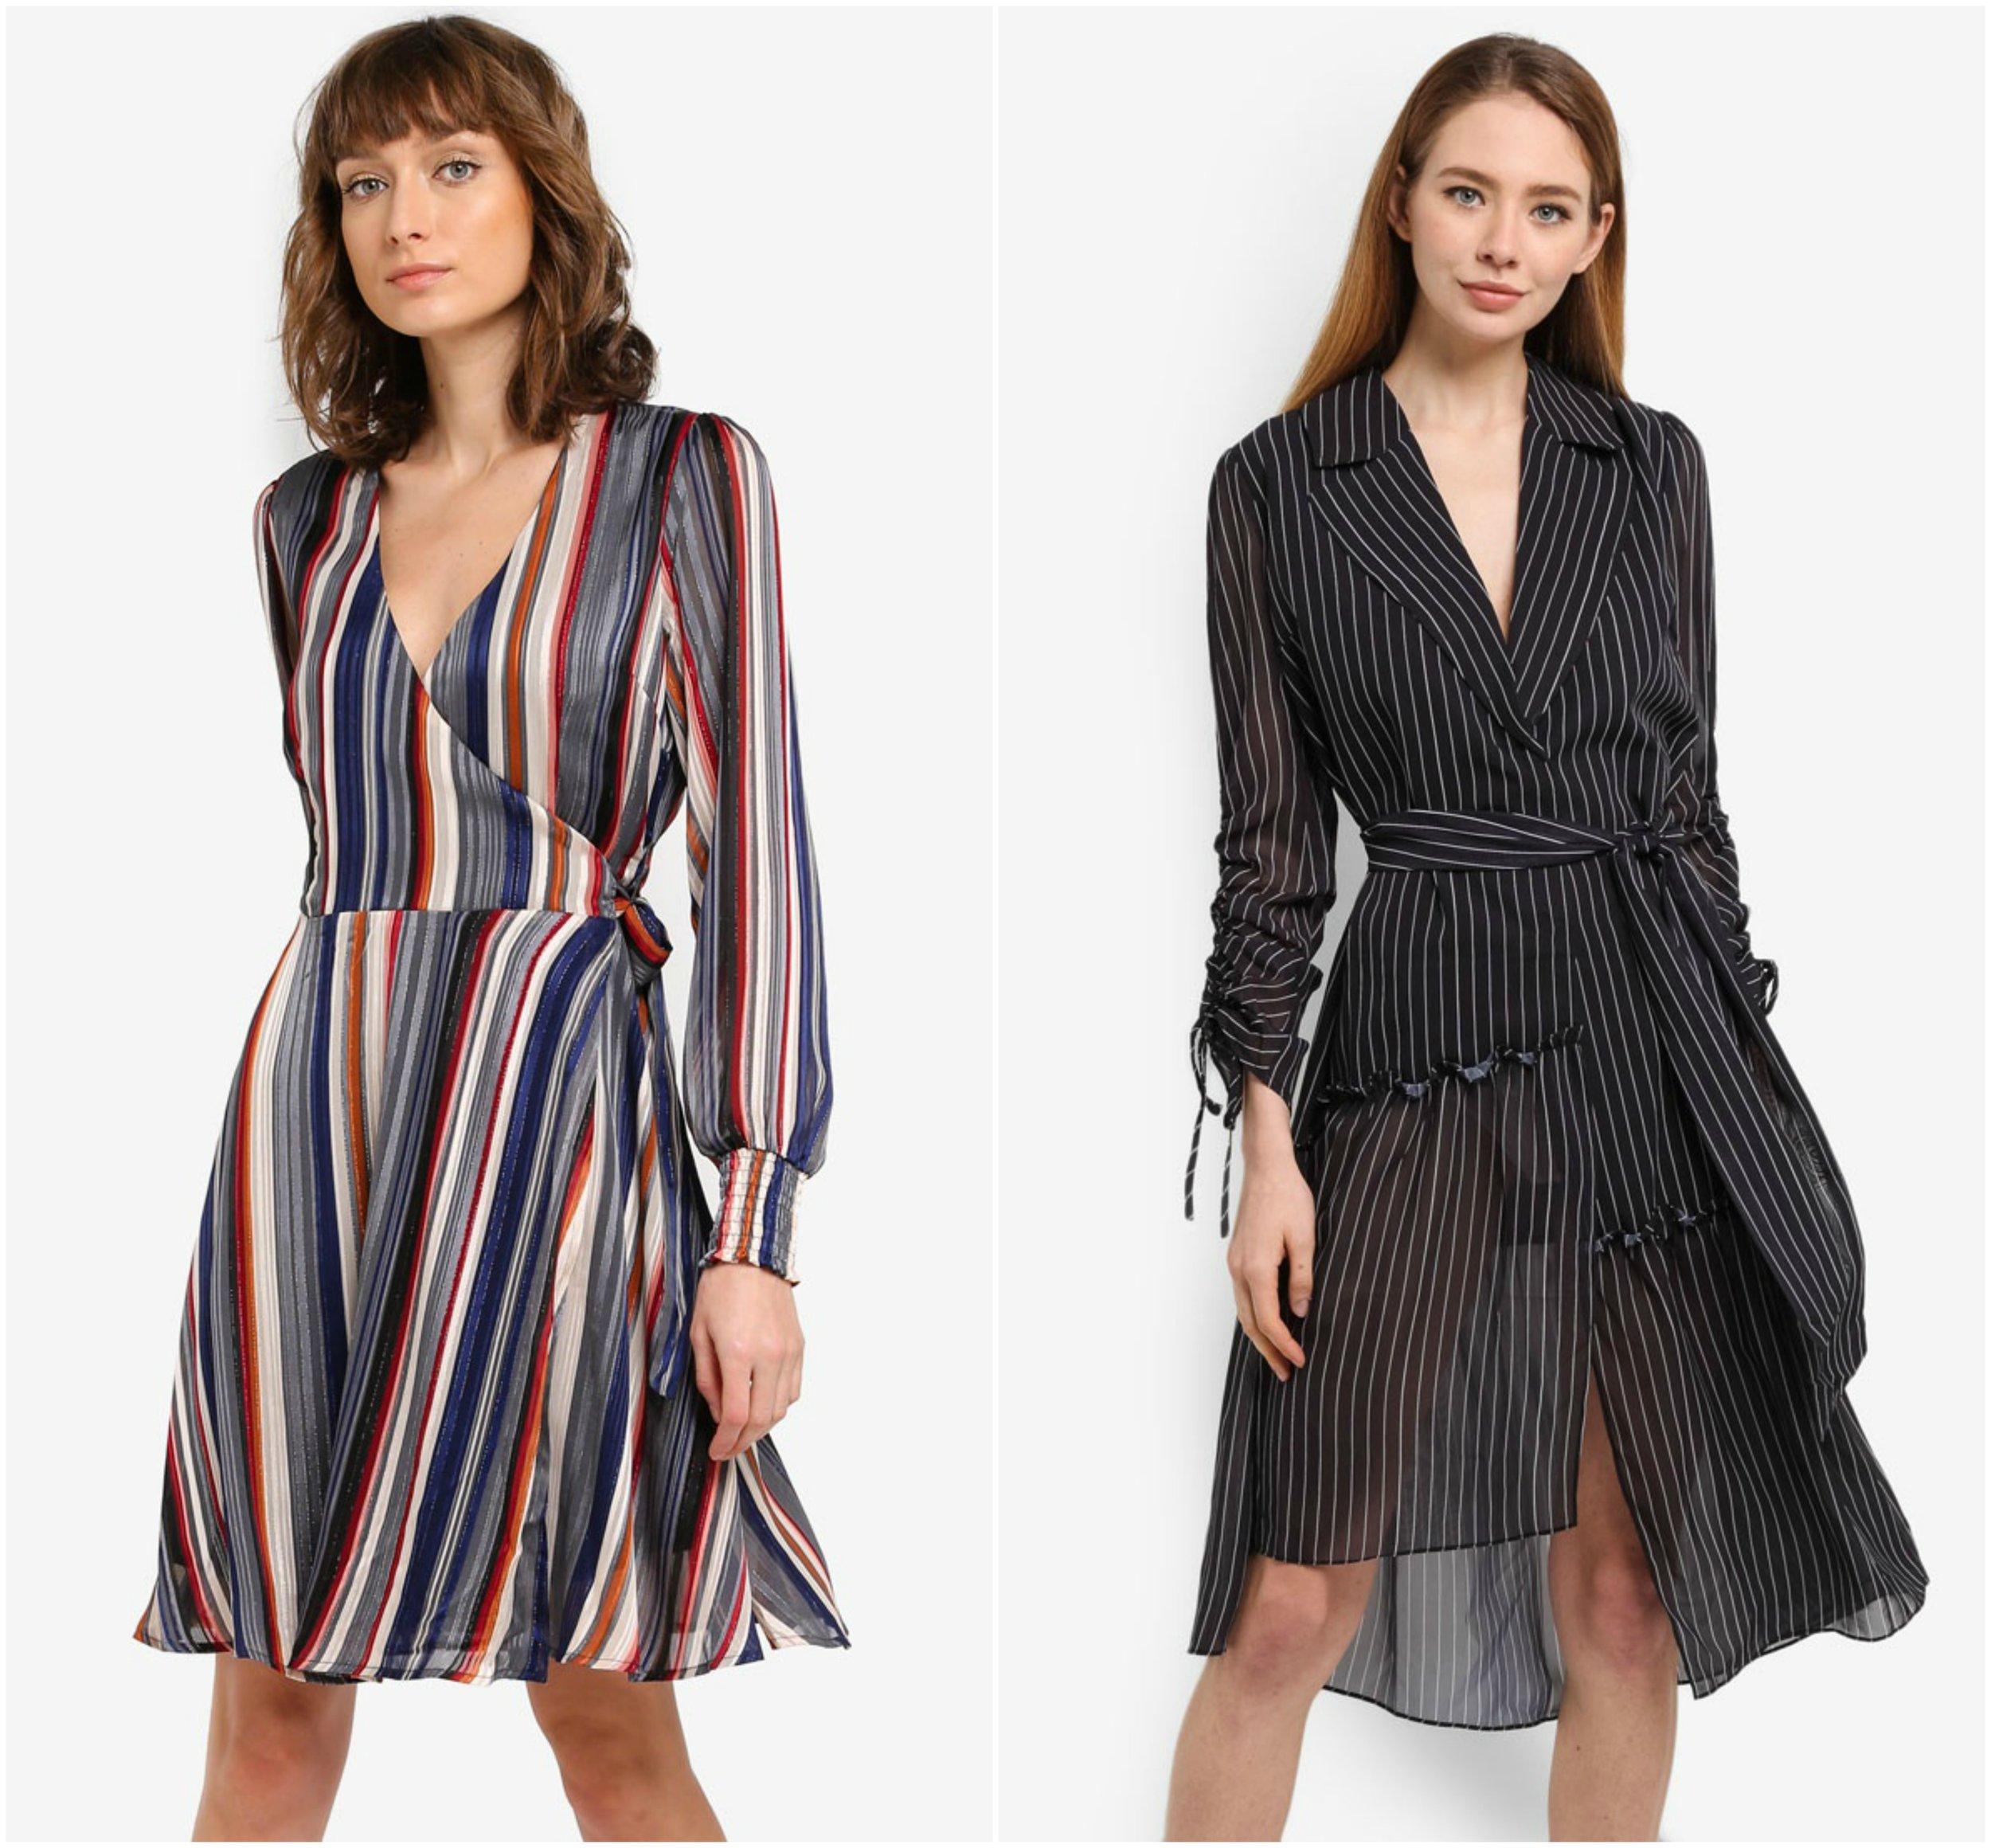 1.  Y.A.S Mison Long Sleeve Dress  , 2.  SELECTED FEMME Dusina Long Sleeve Dress